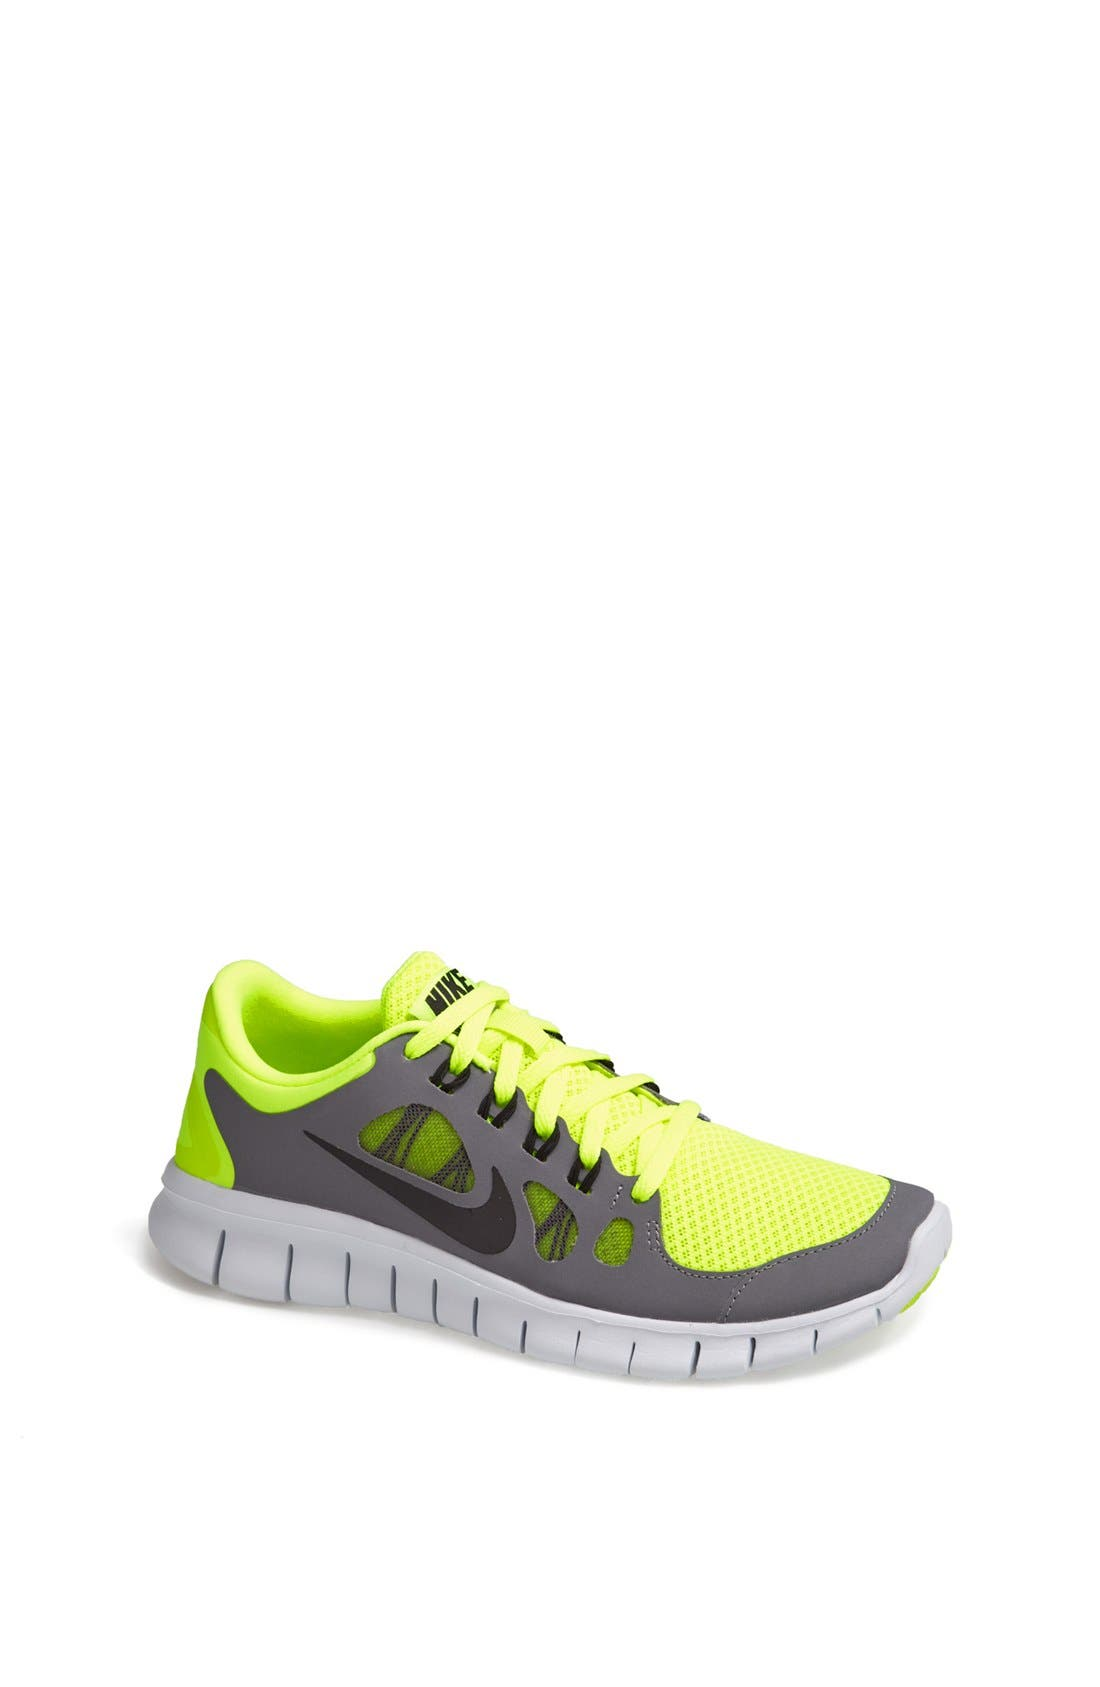 Main Image - Nike 'Free Run 5.0' Running Shoe (Big Kid)